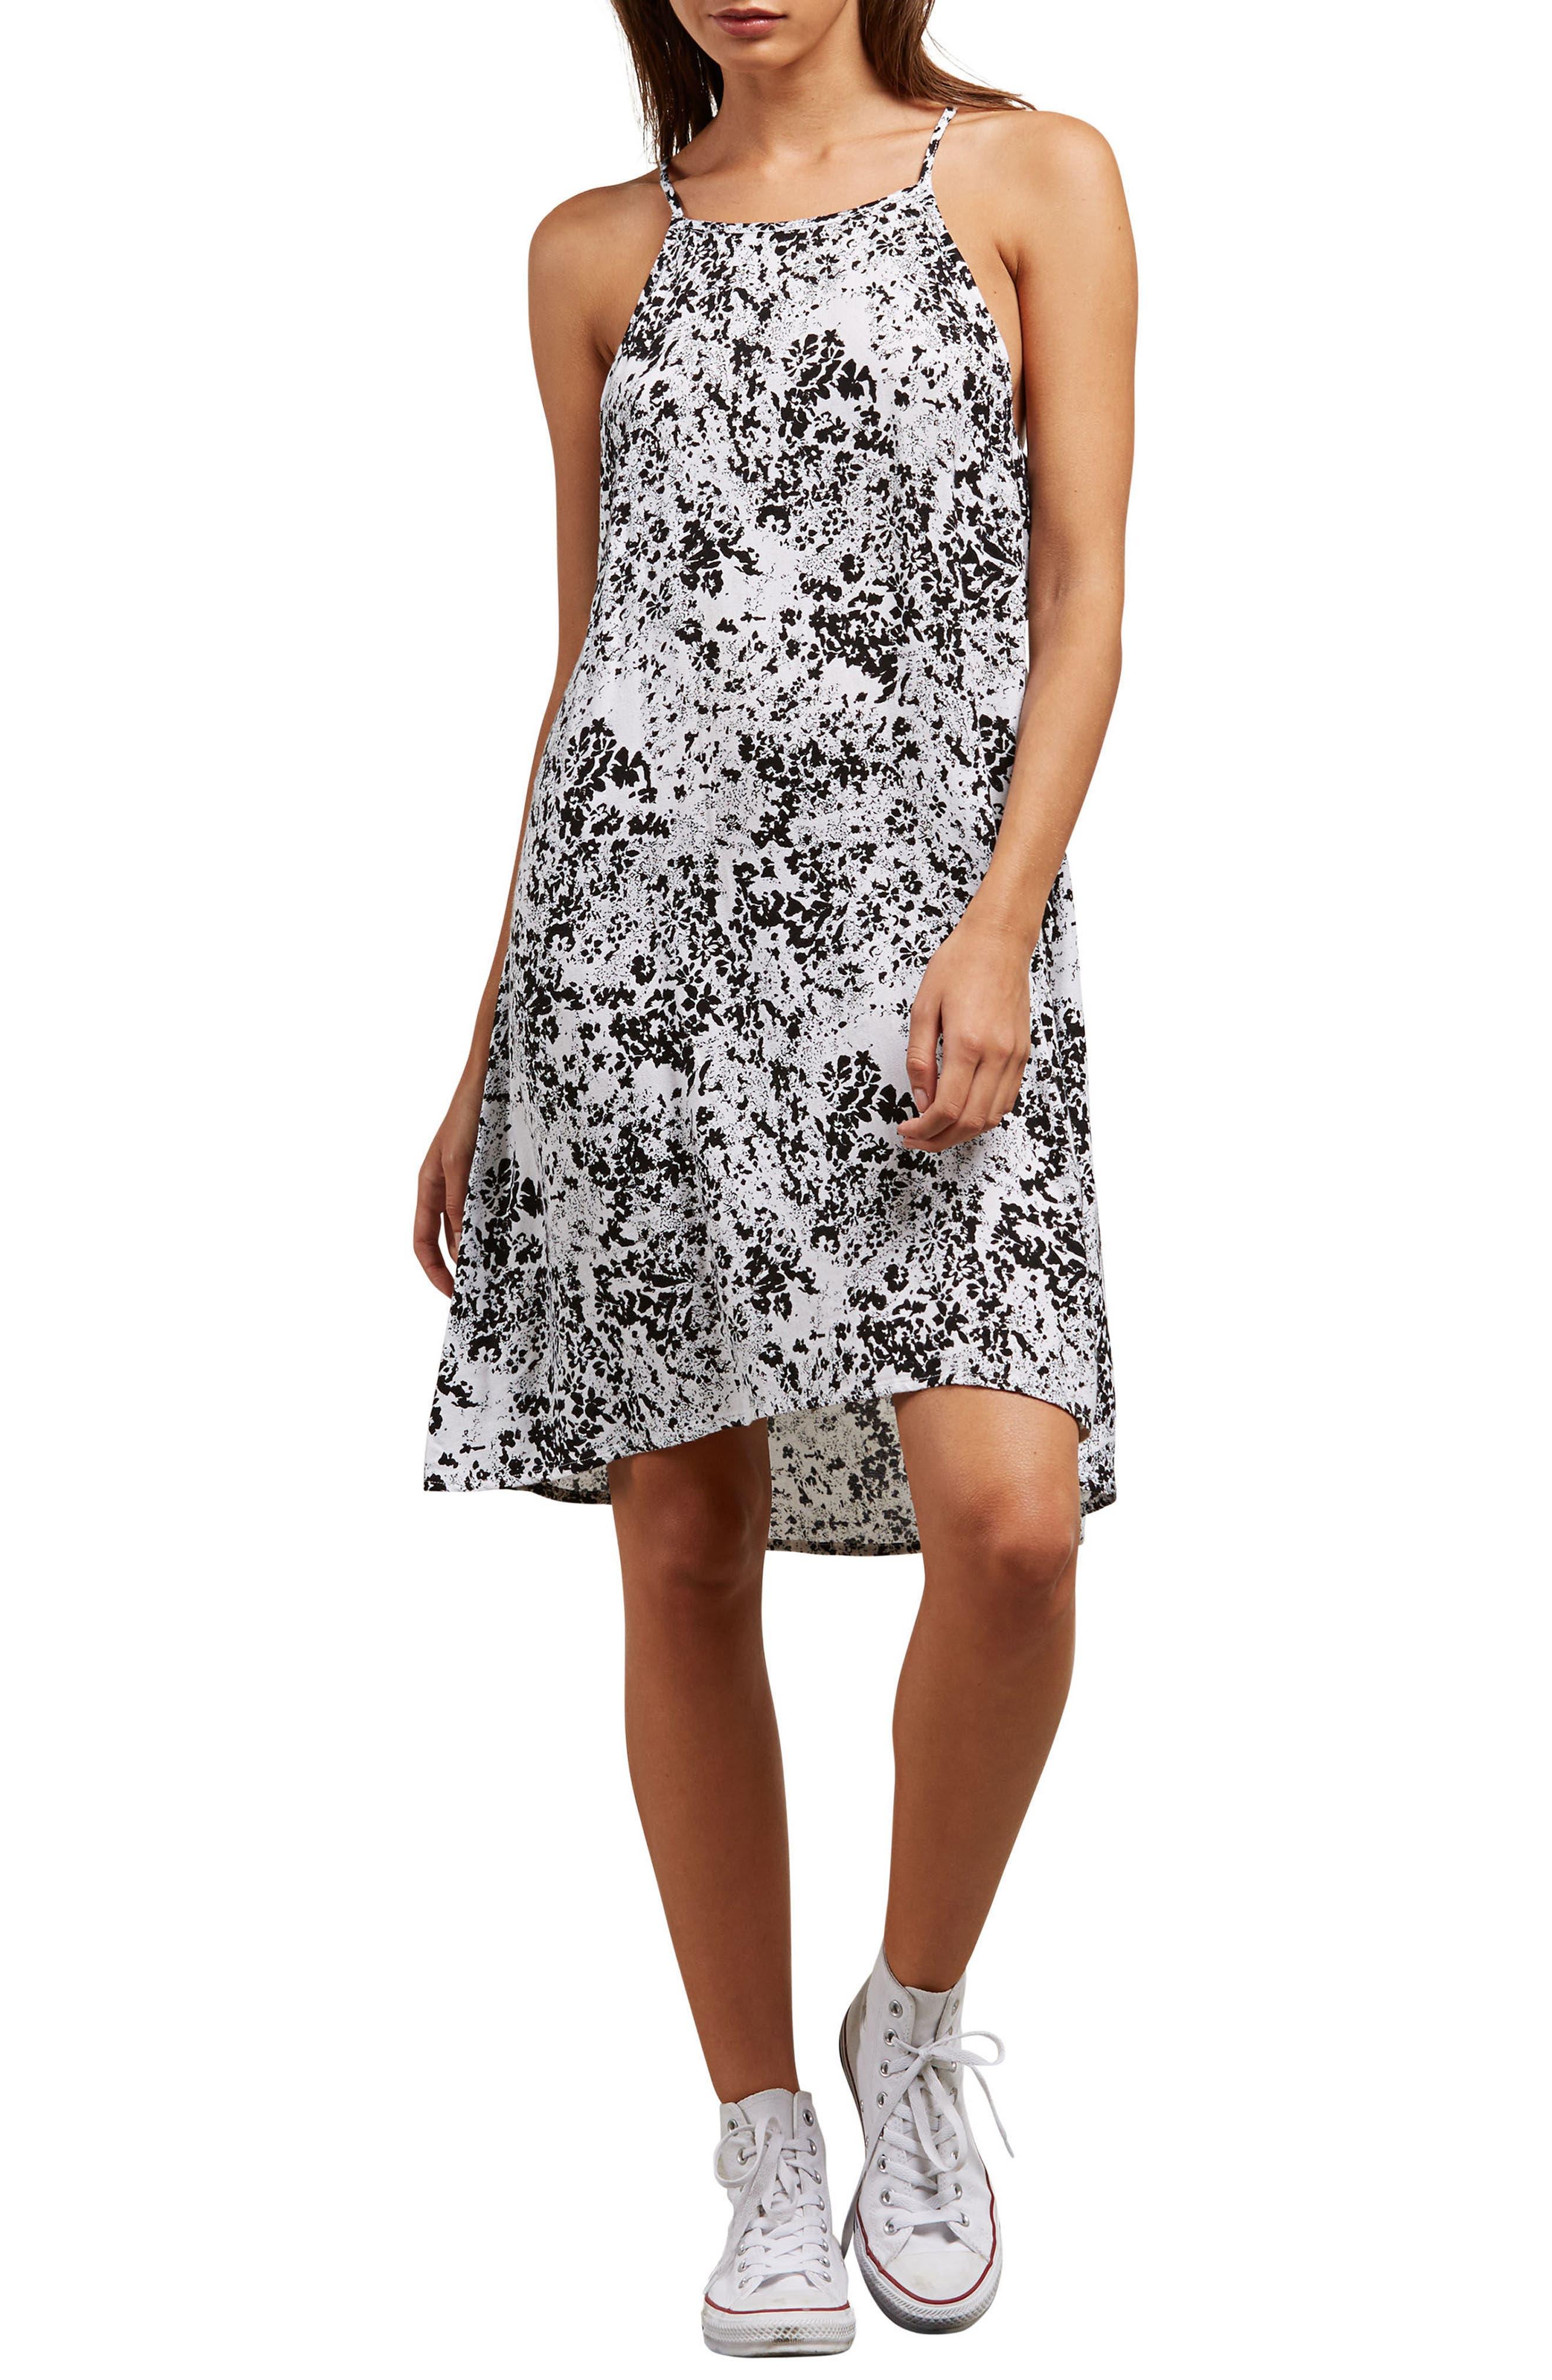 Soul Window Dress,                         Main,                         color, Black/ White